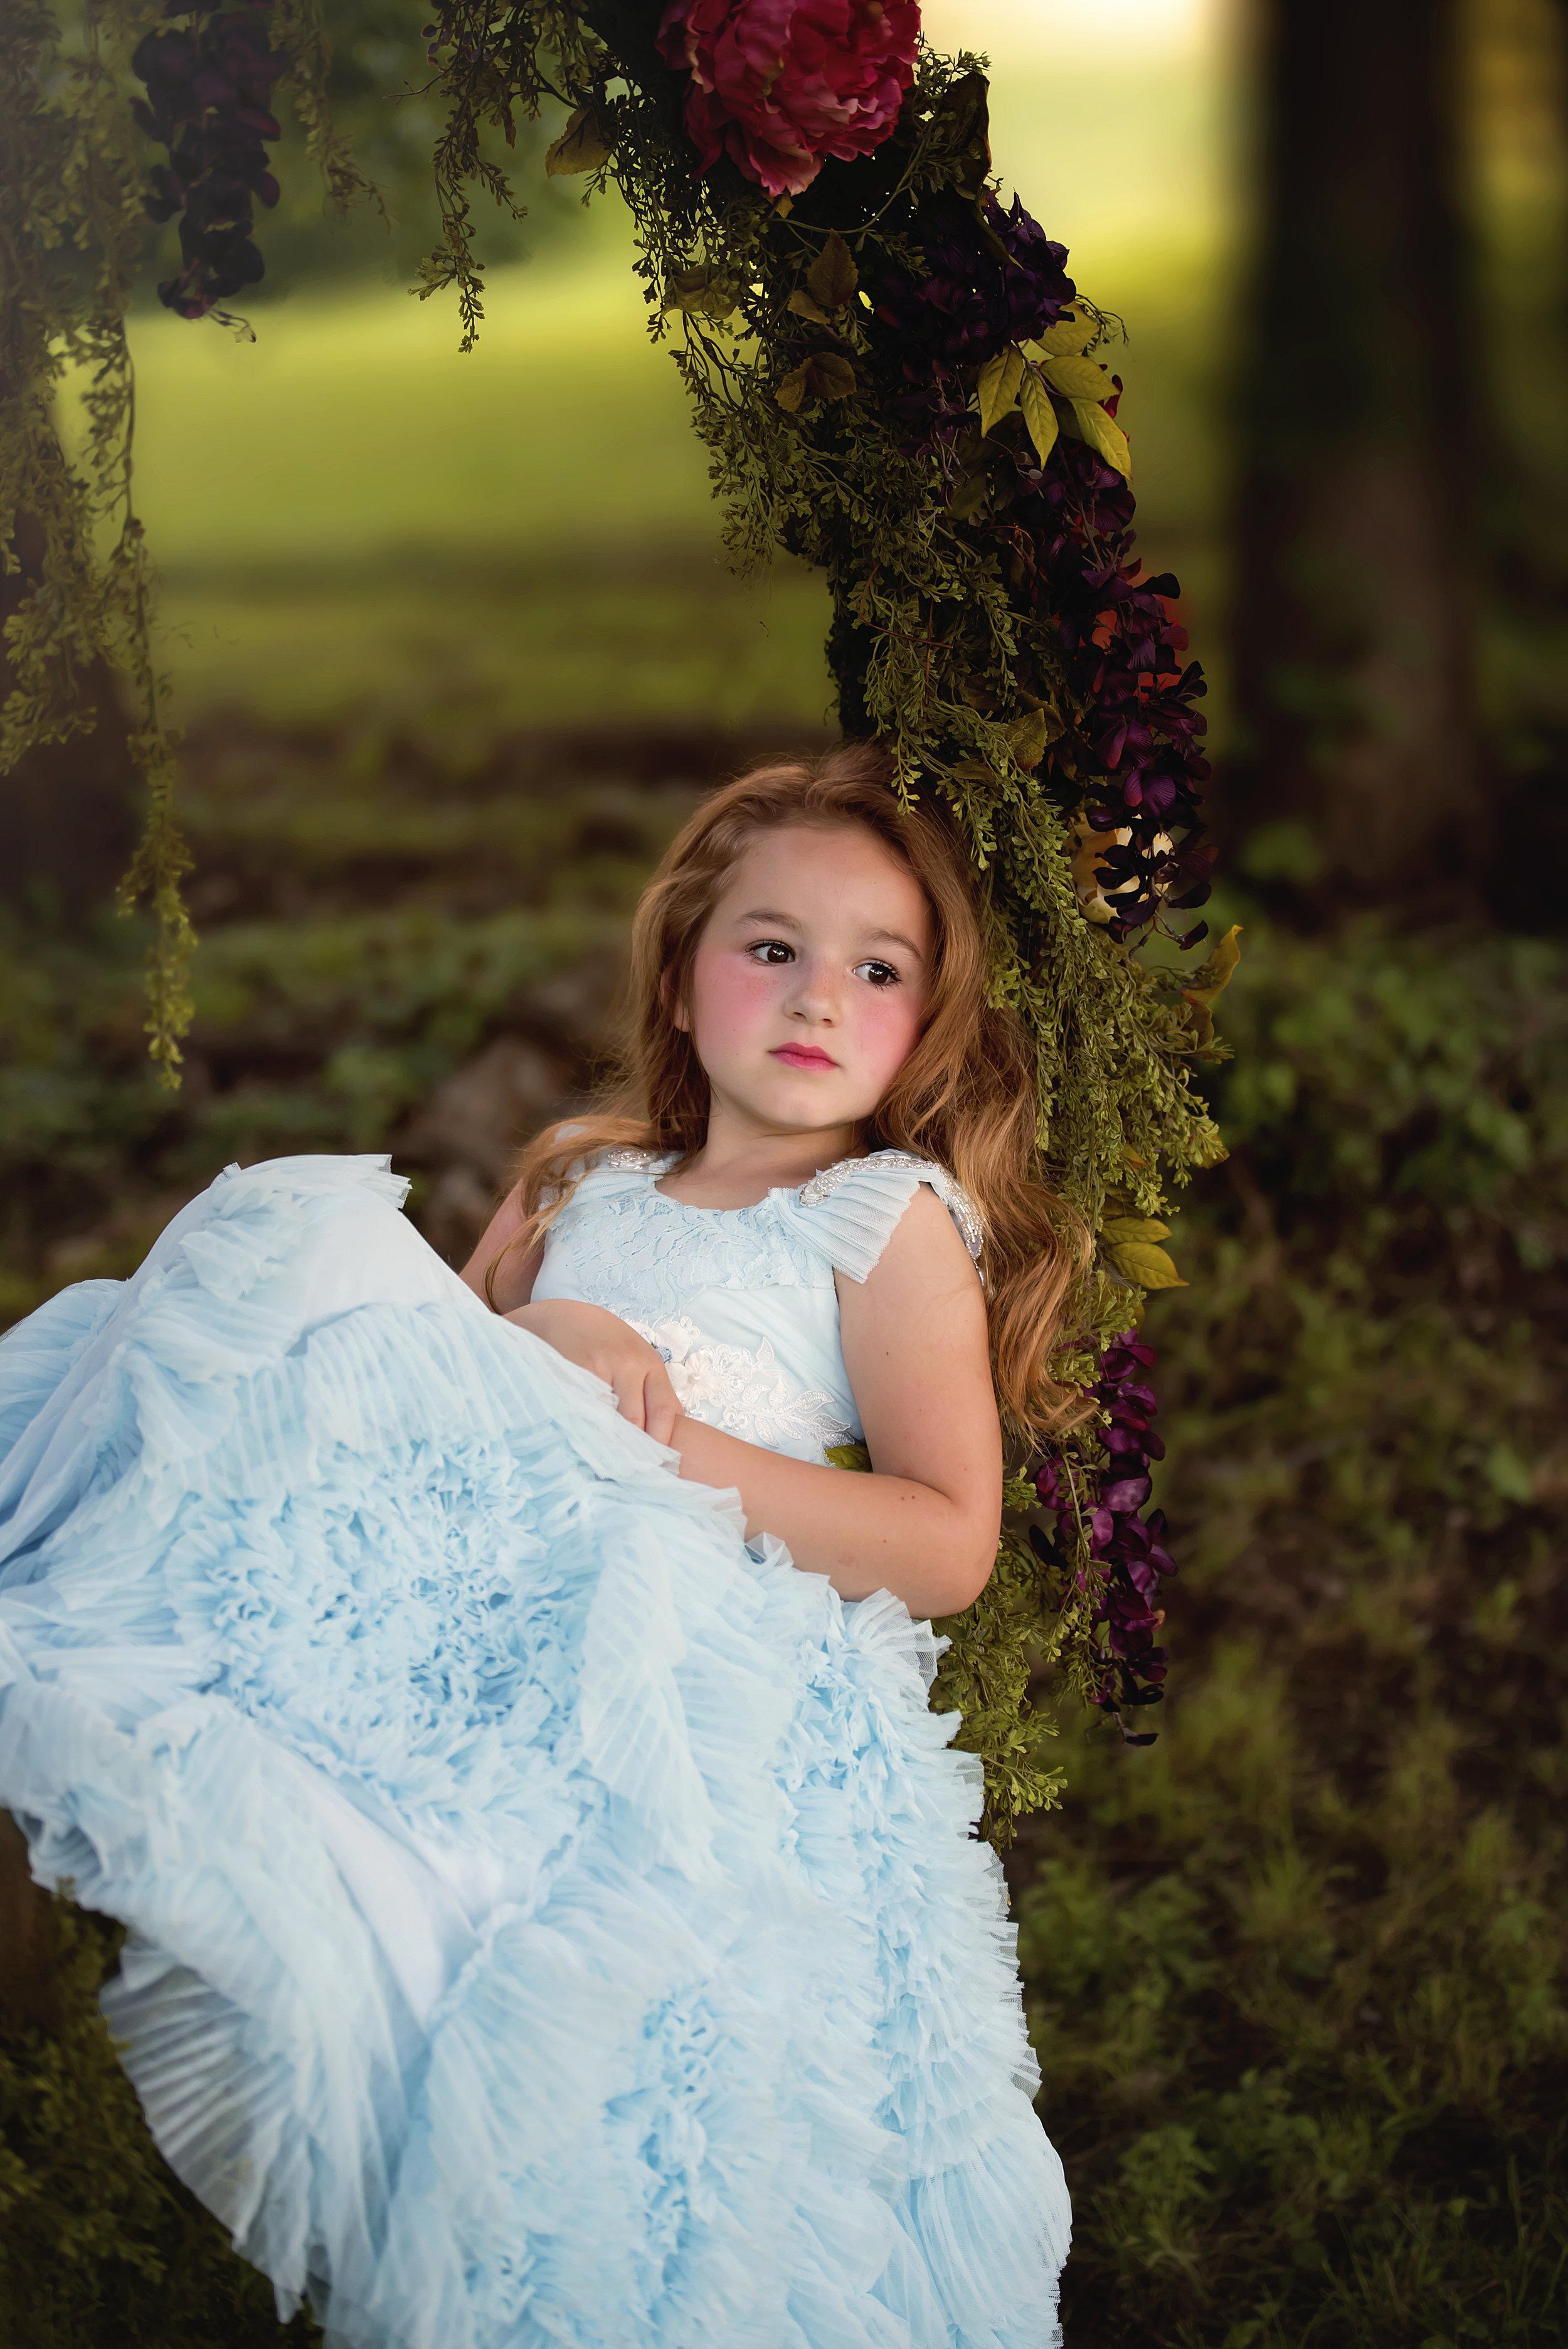 Reina-LeGrand-Photography-Photographer-Family-DFW-Dallas-Fort-Worth-Denton-Southlake-Colleyville-Grapevine-Roanoke-Keller-Westlake-Portrait-Portraiture-Photo-Session-Maren3.jpg